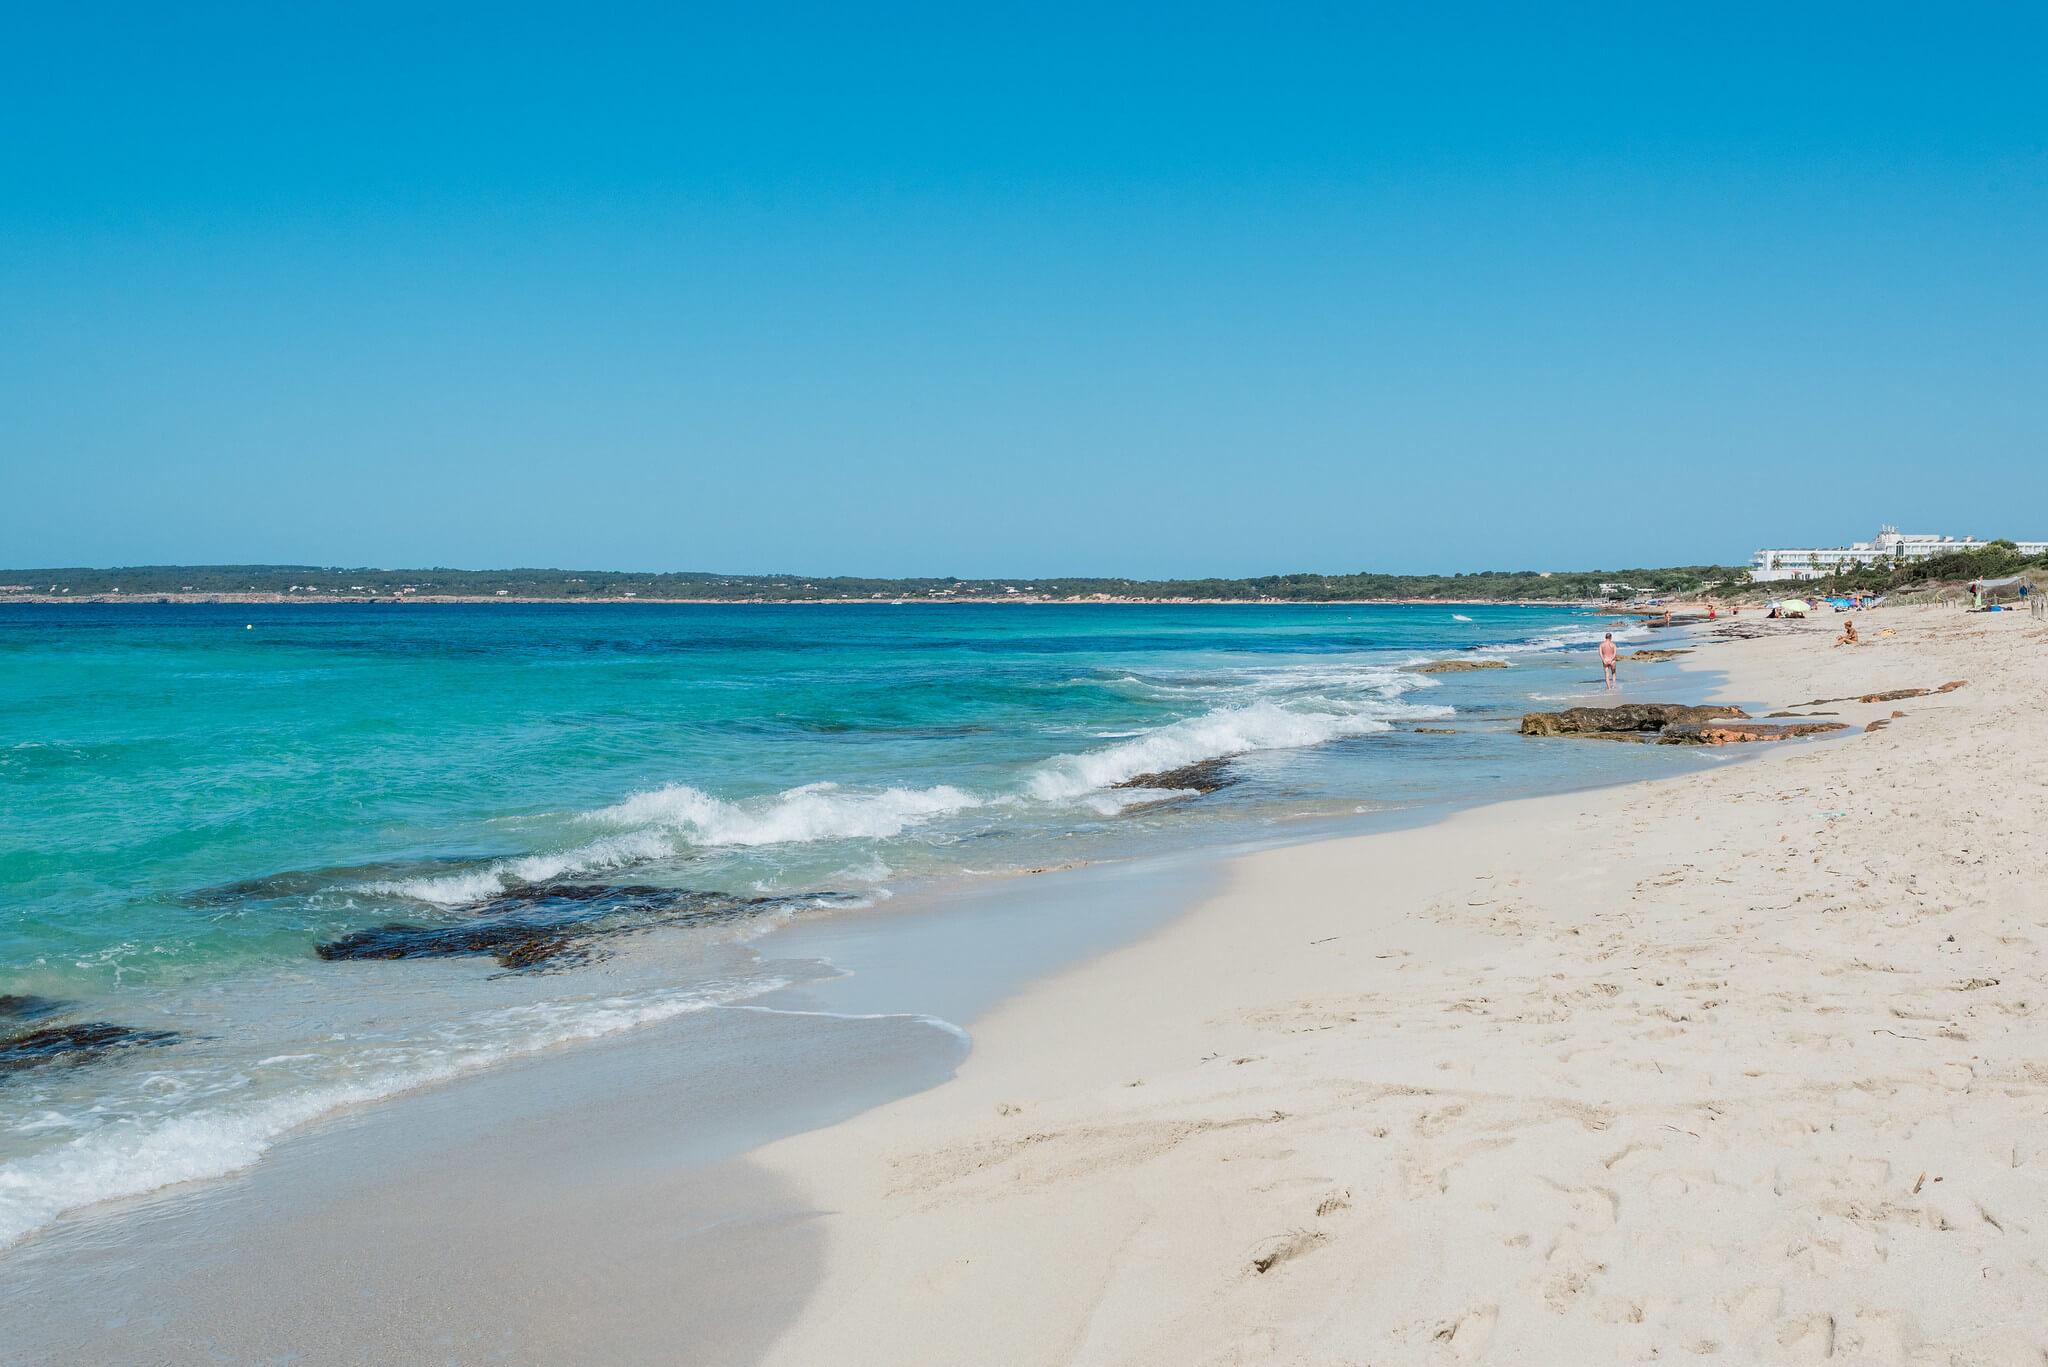 https://www.white-ibiza.com/wp-content/uploads/2020/03/formentera-beaches-migjorn-2020-08.jpg